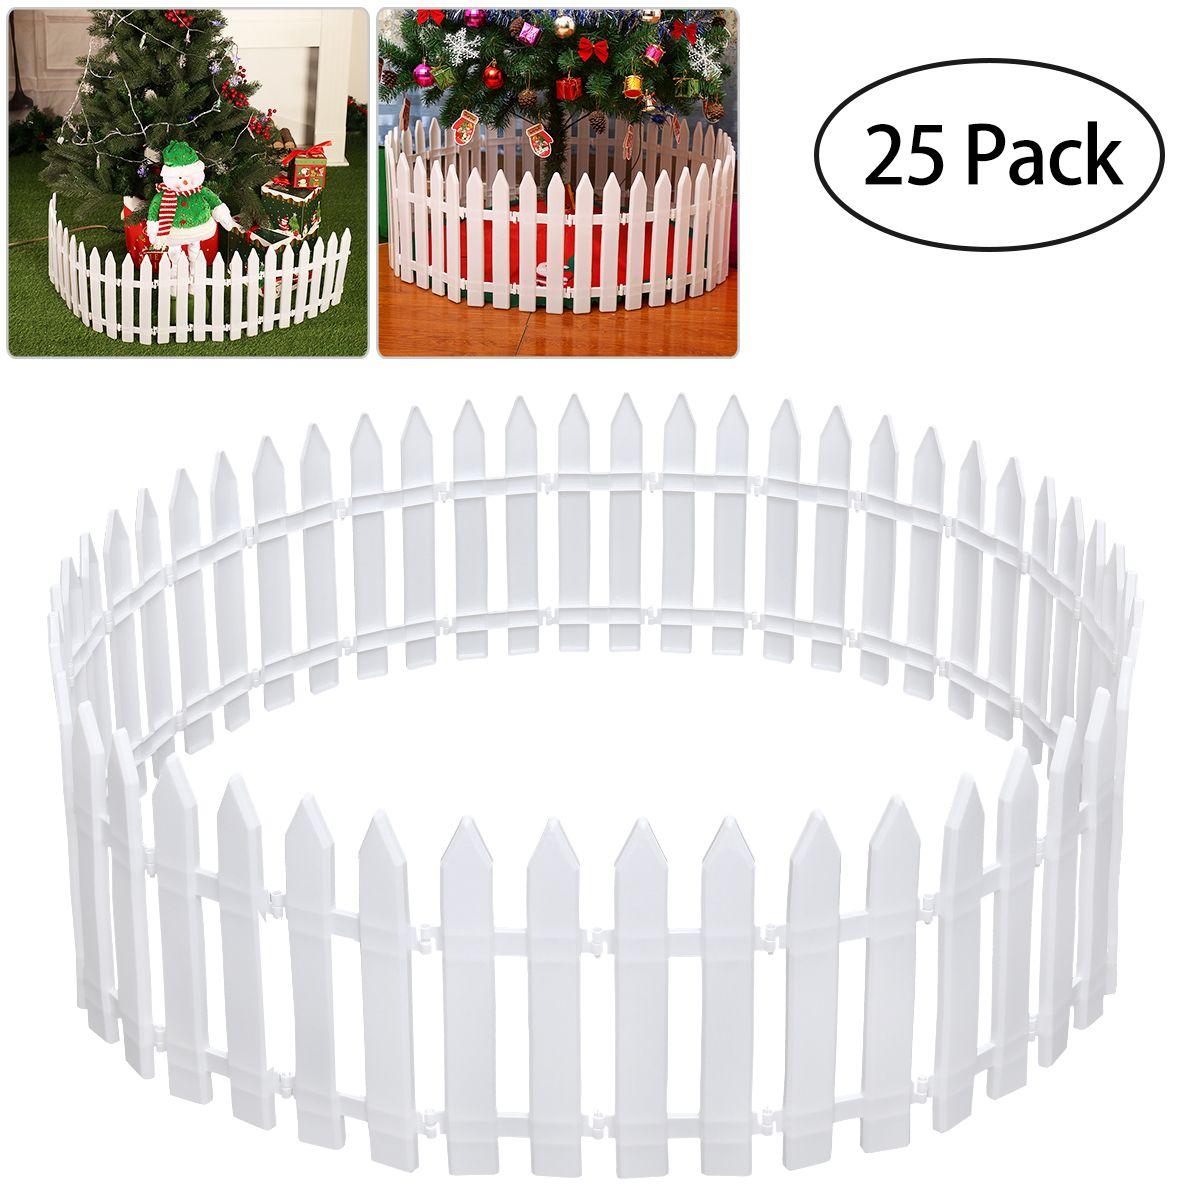 White Plastic Fence Miniature Home Garden Christmas Xmas Tree Wedding Party Decoration (25 Pieces)